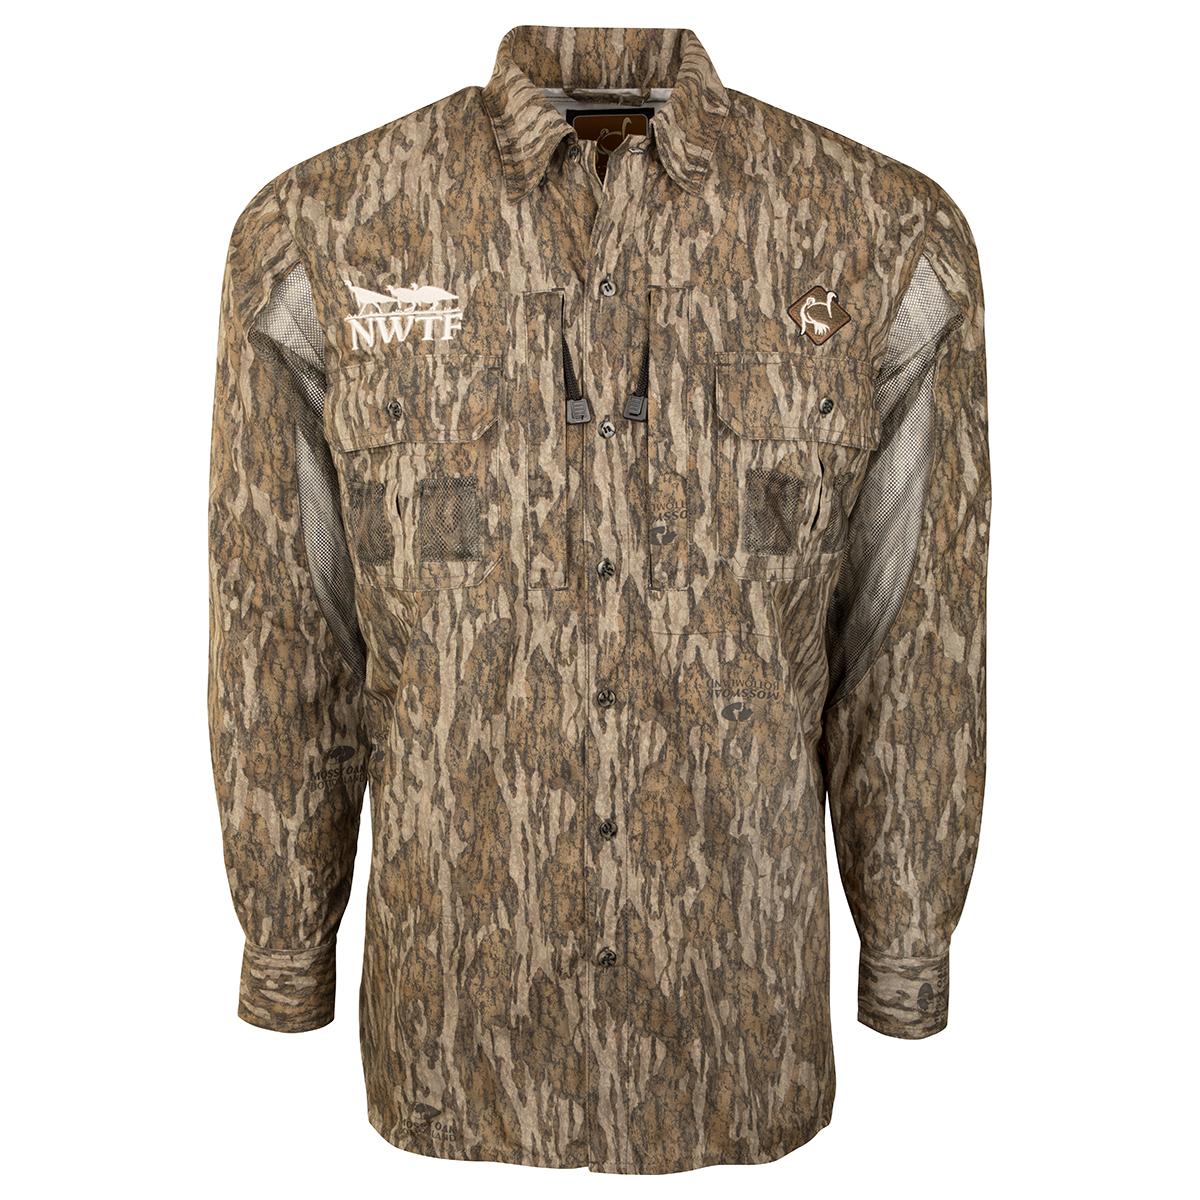 drake-ventless-ol-tom-big-tall-mesh-shirt-bigcamo-mossy-oak-bottomland